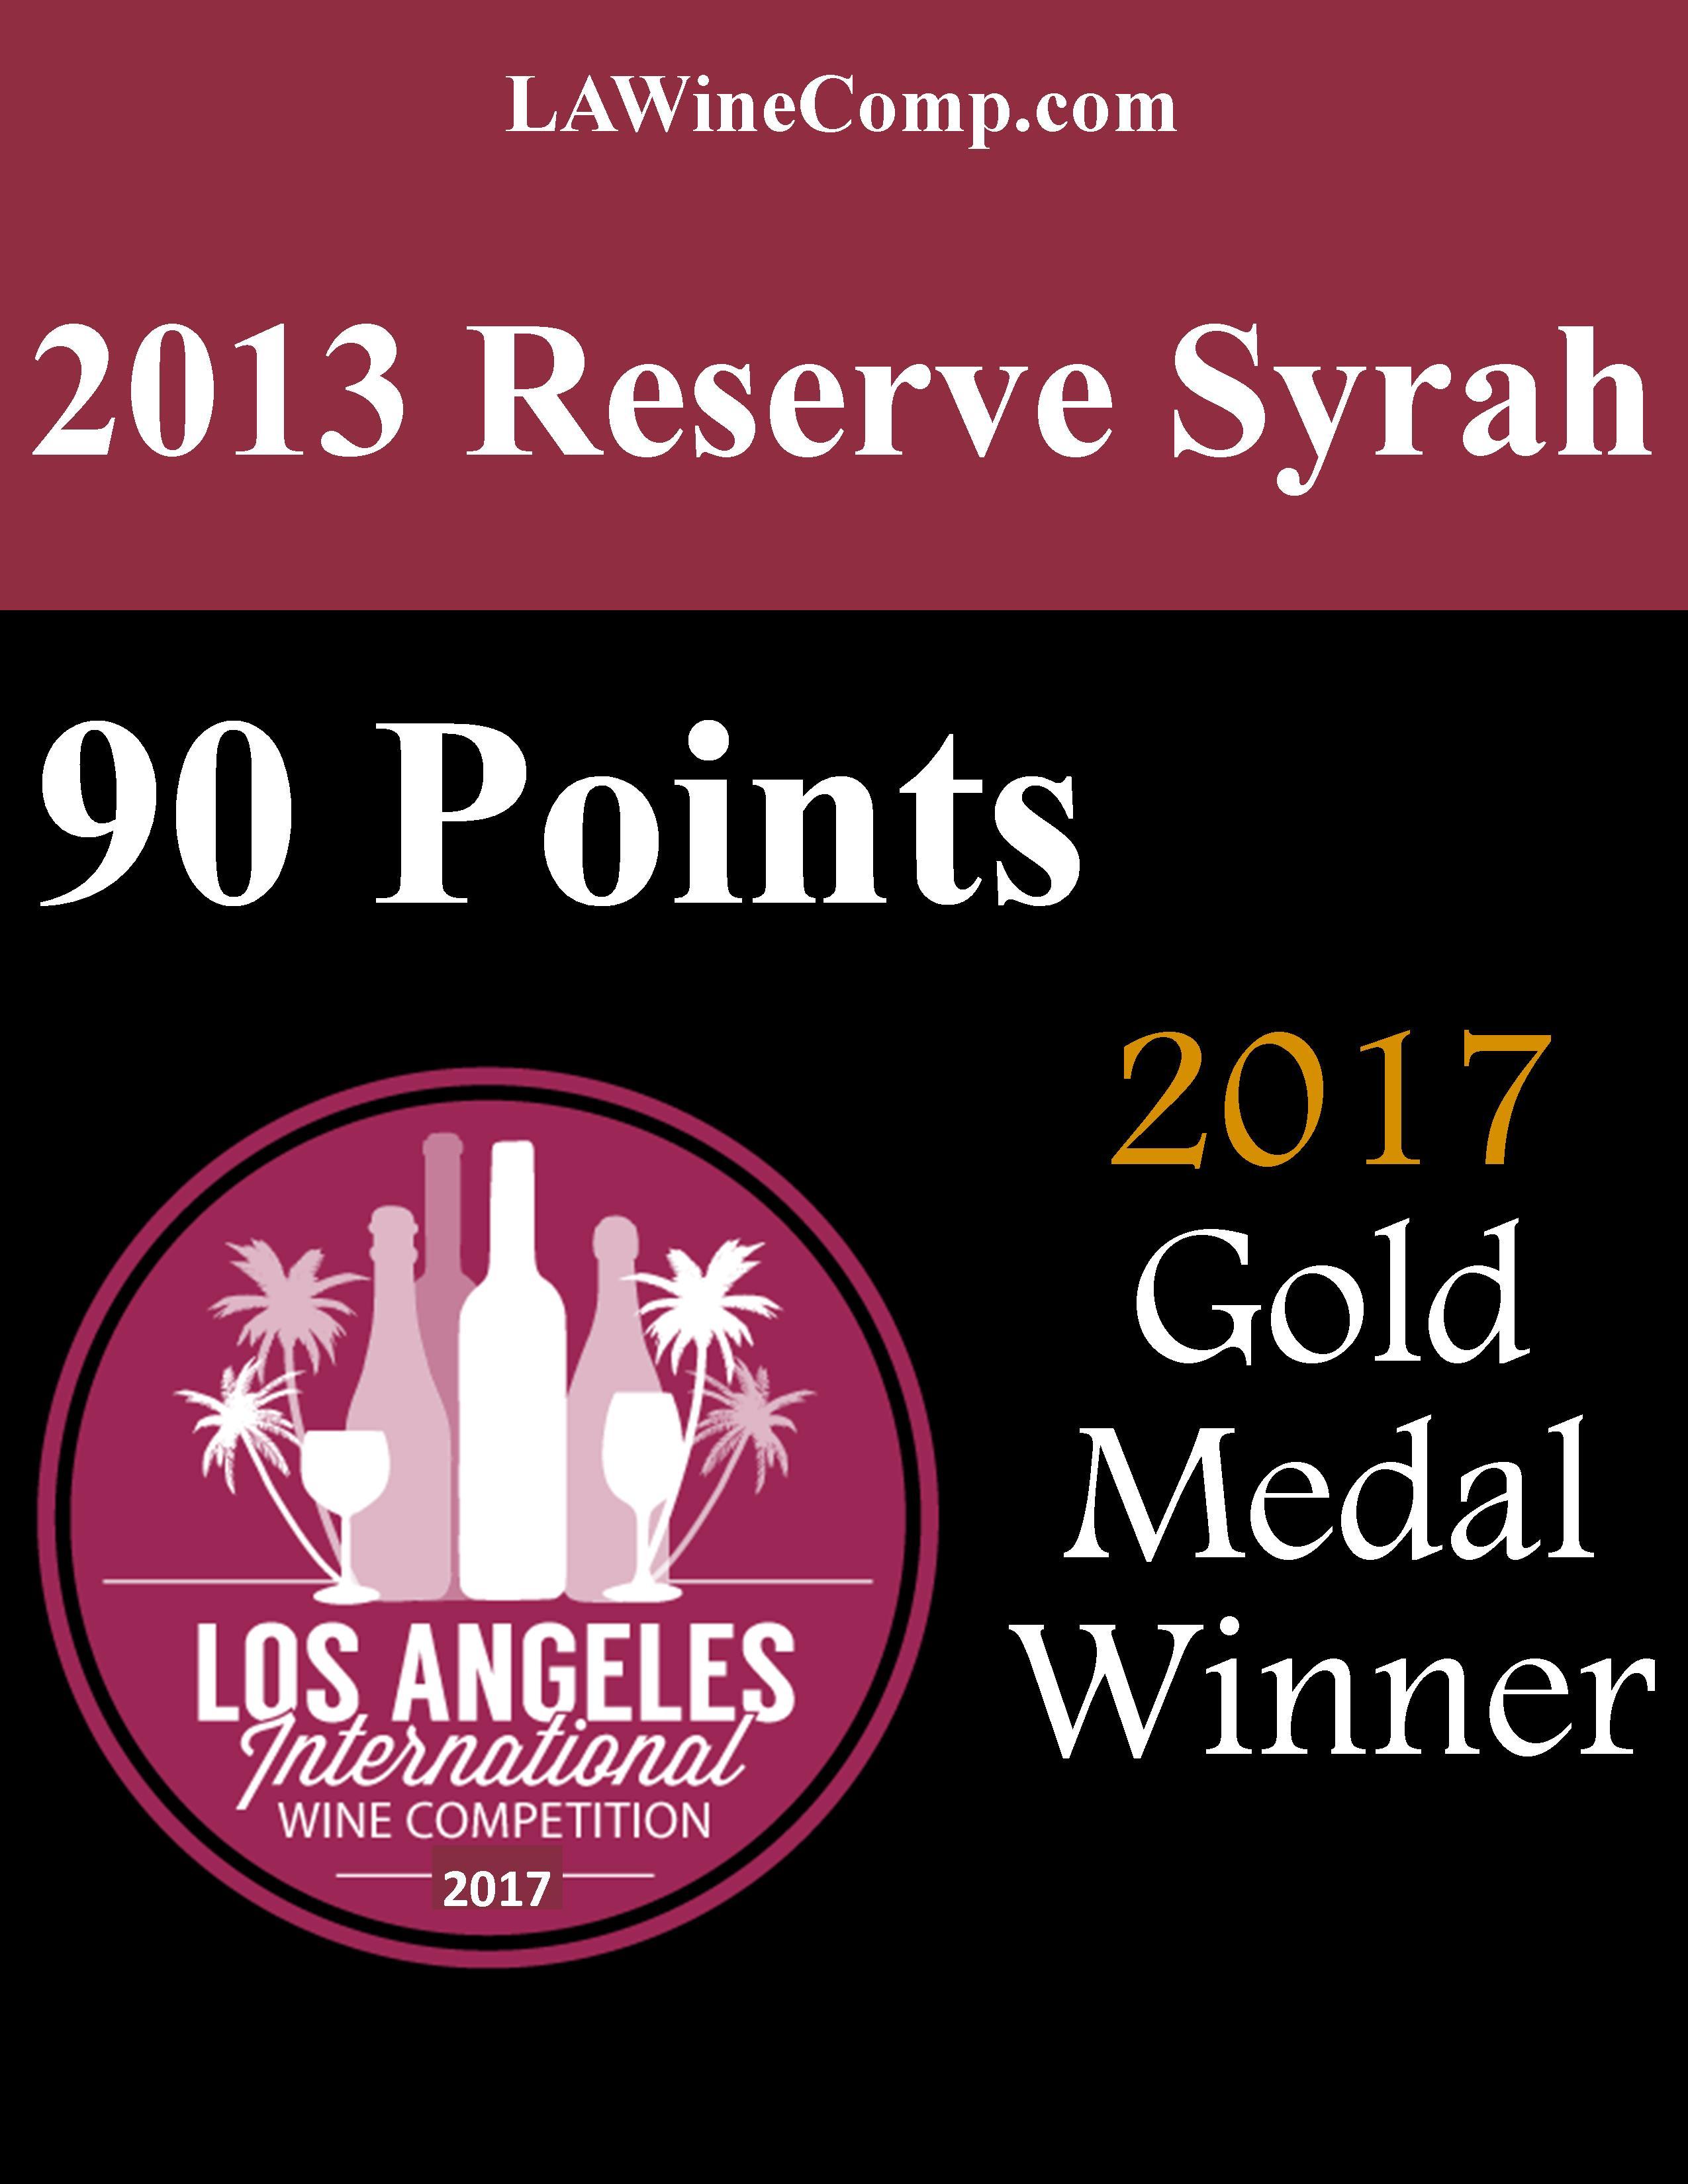 2013 Res Syrah LA